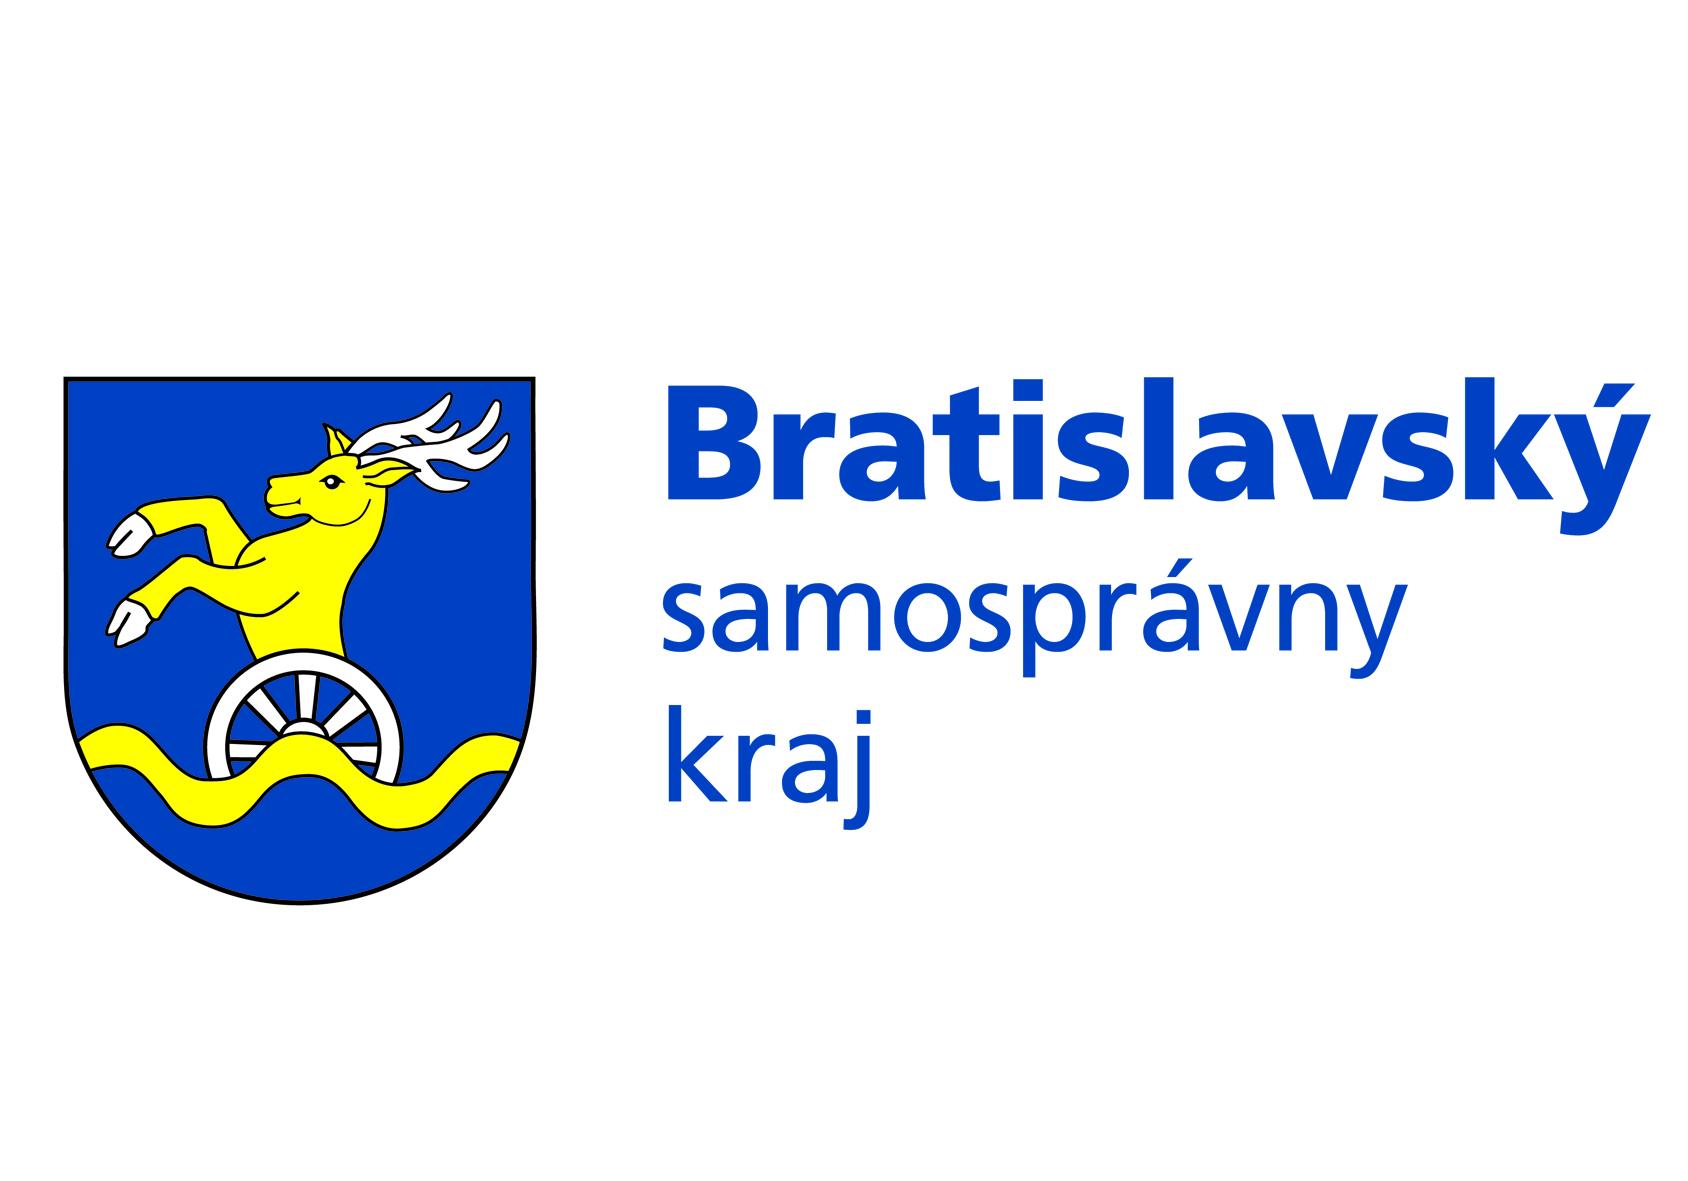 bratislavsky samospravny kraj, amavet, logo, partneri